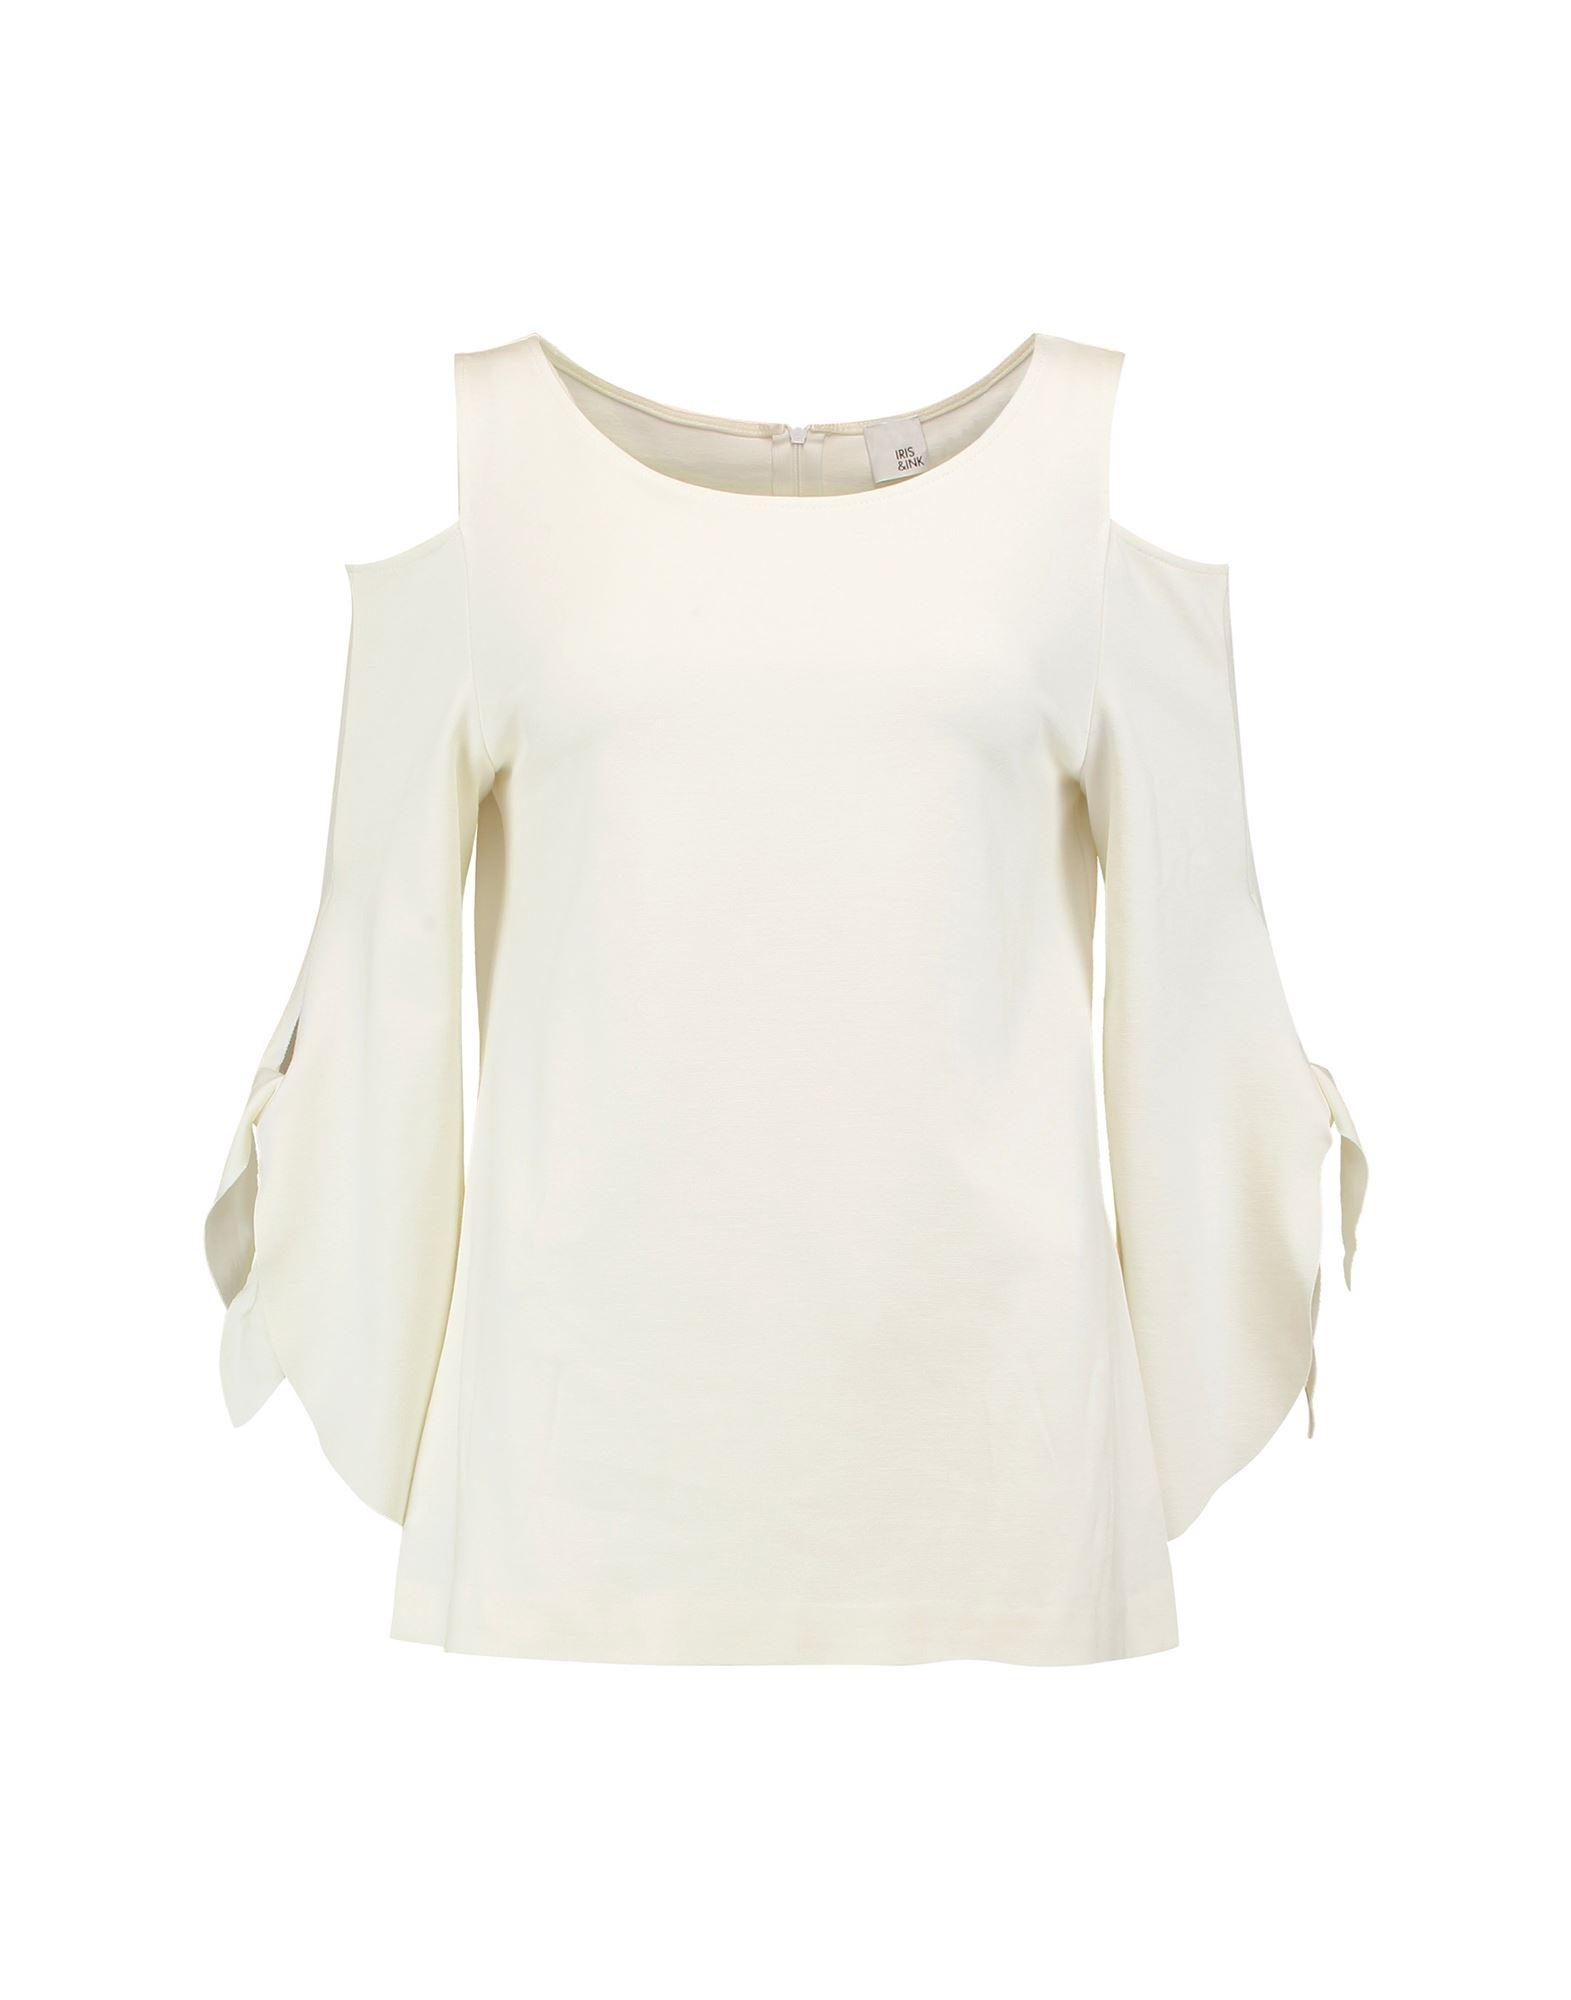 IRIS & INK T-Shirt in Ivory